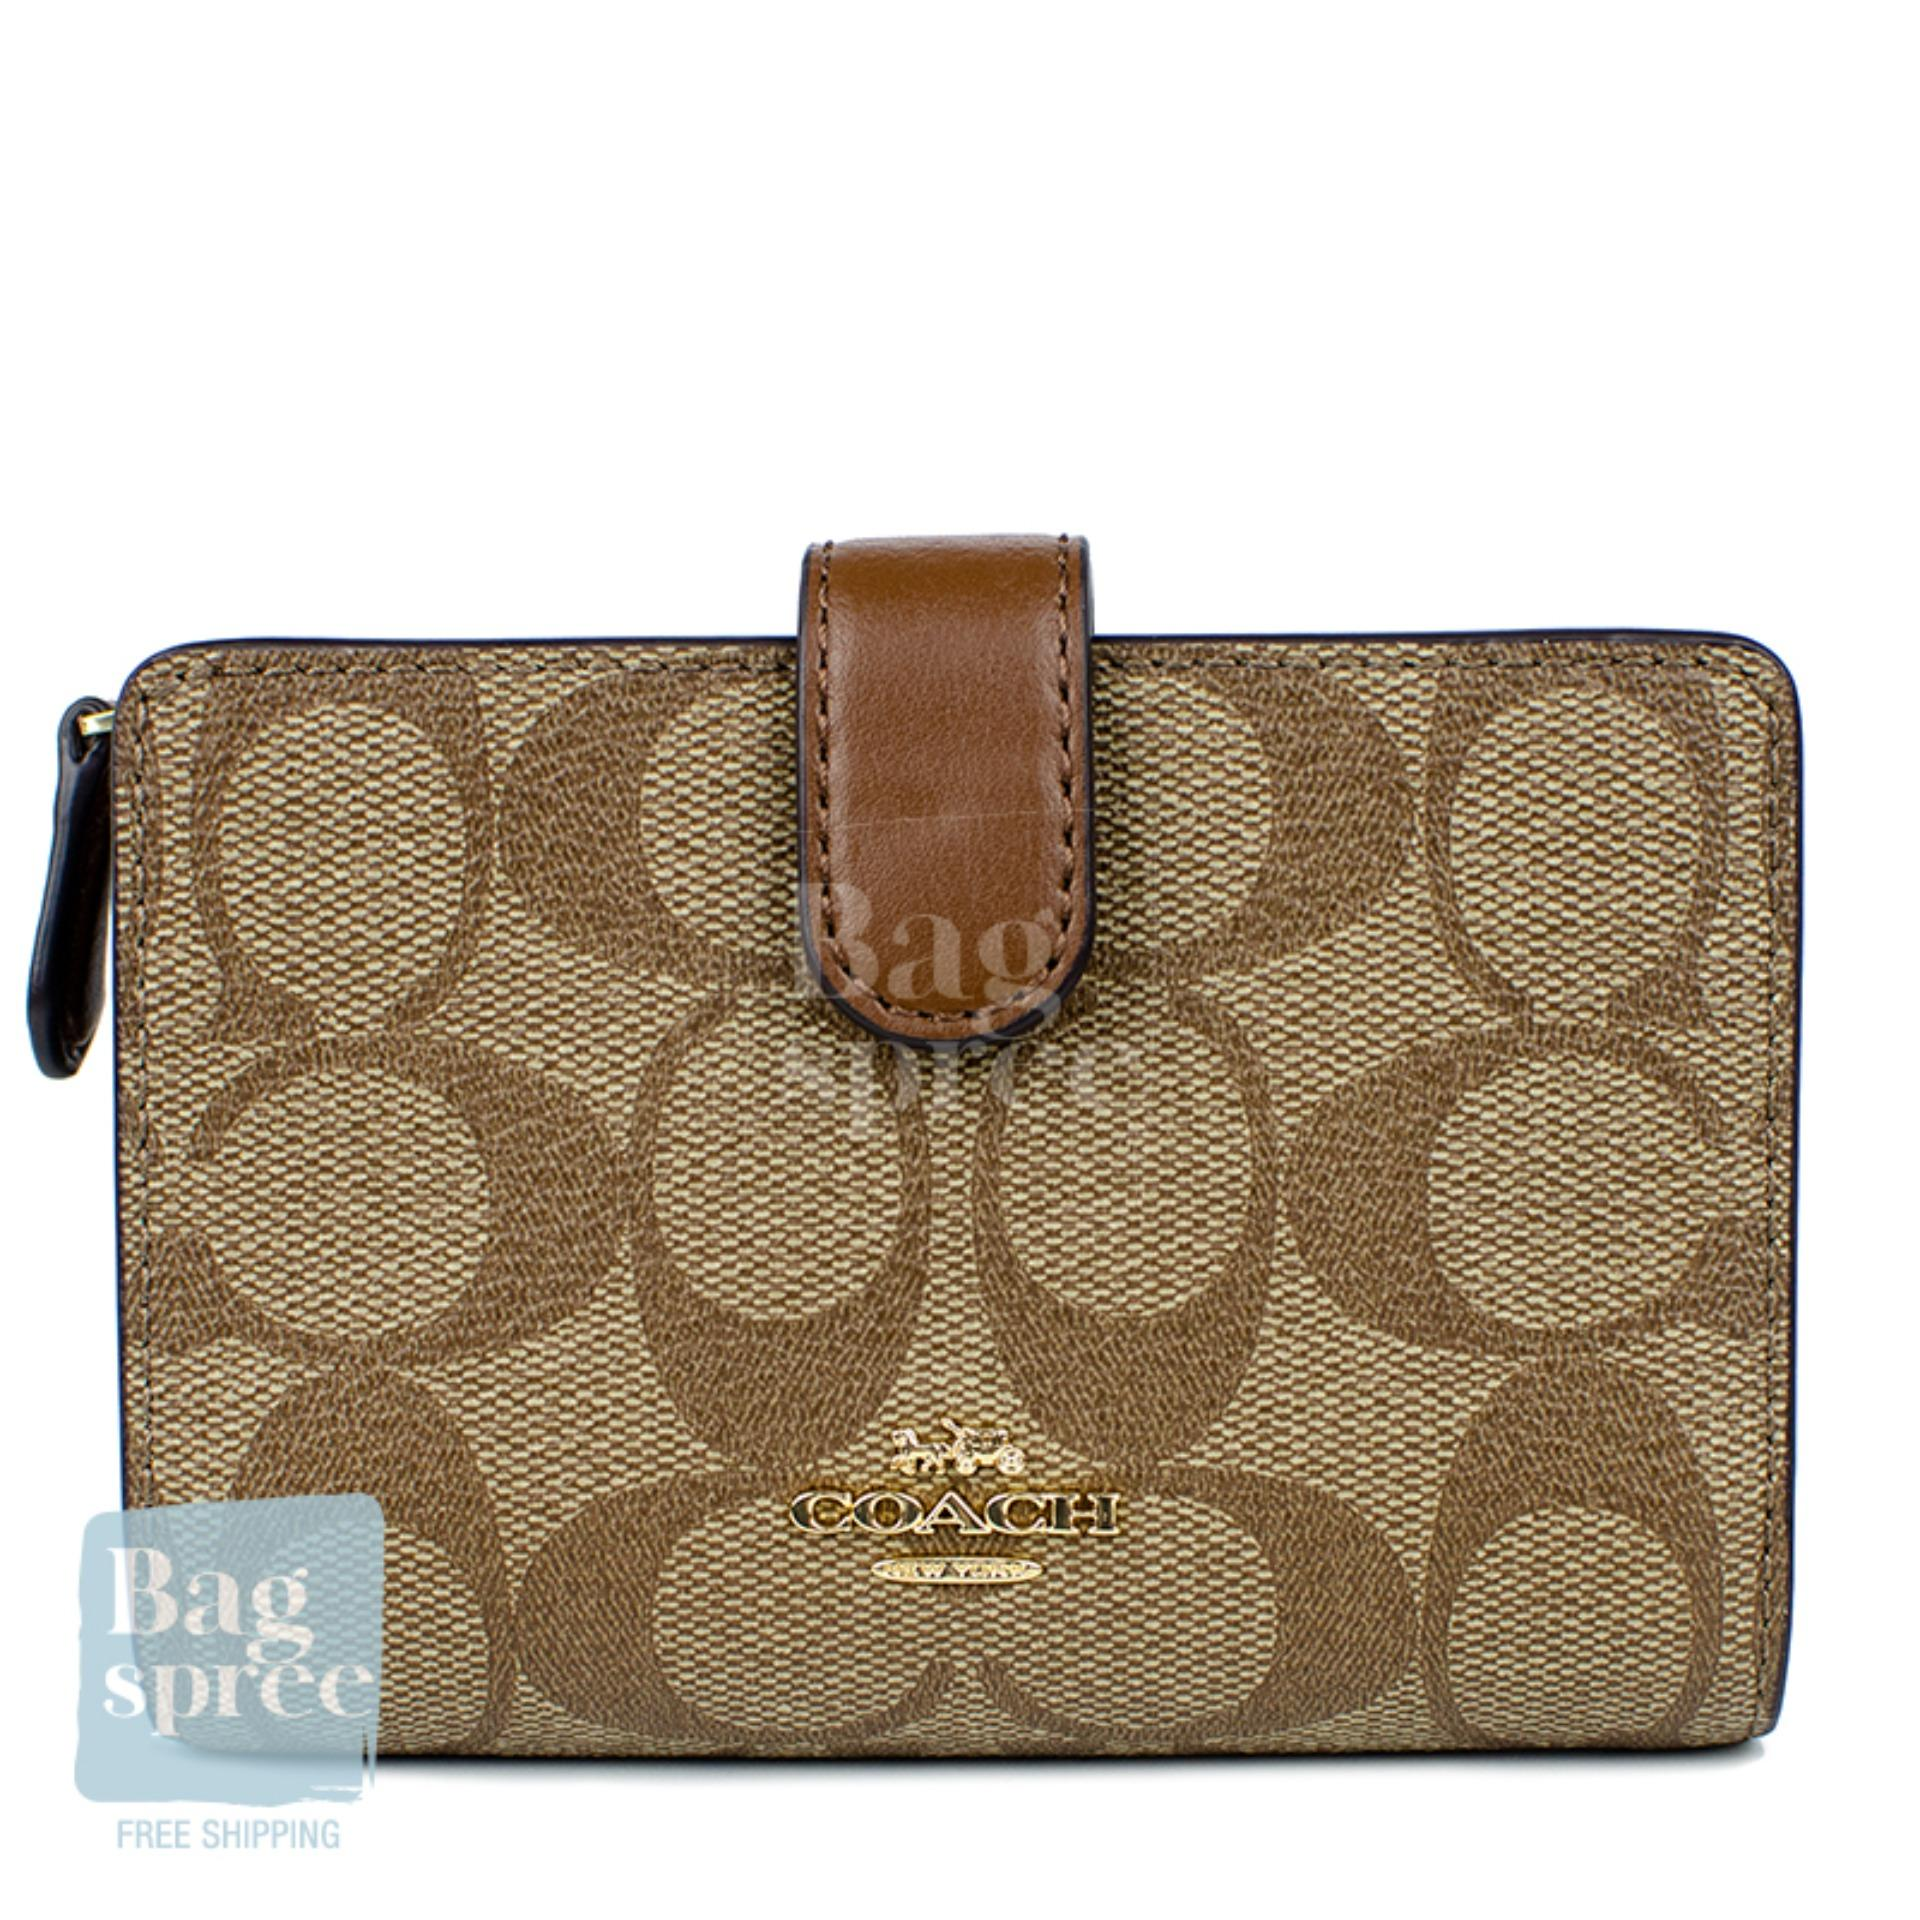 119a5836 *Authentic & Brand New* Coach Medium Corner Zip Wallet F11484 F23553 [Gift  Receipt Provided] [OL]